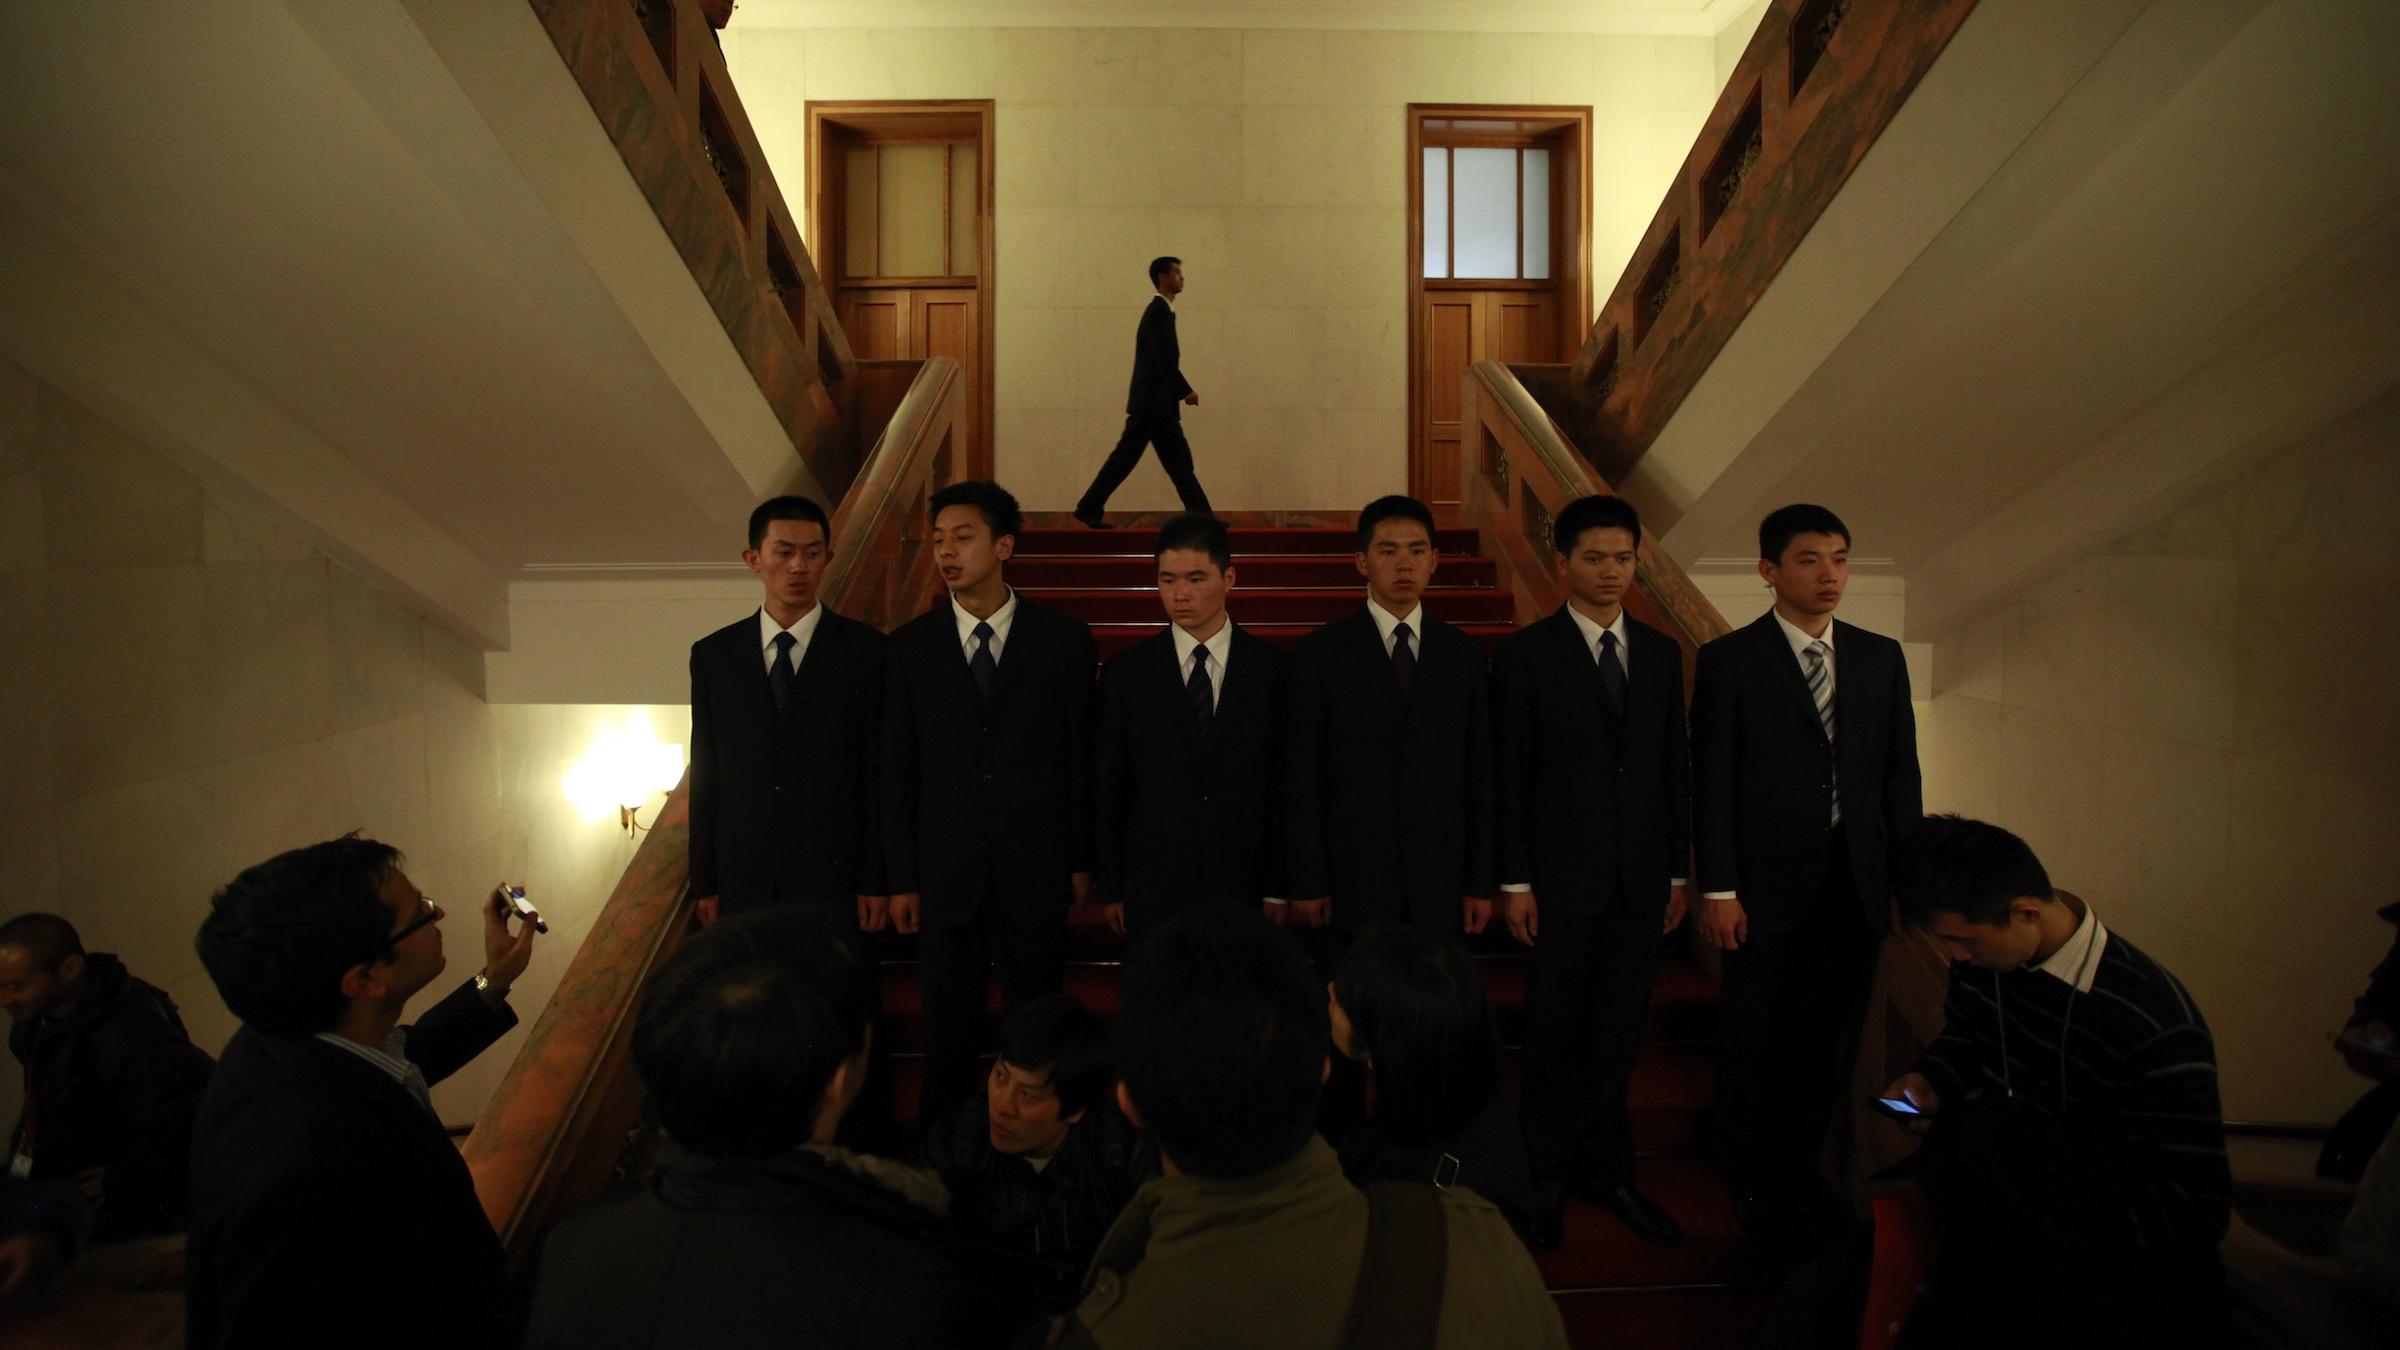 Security guards at Gu Kailai's trial in Chongqing.